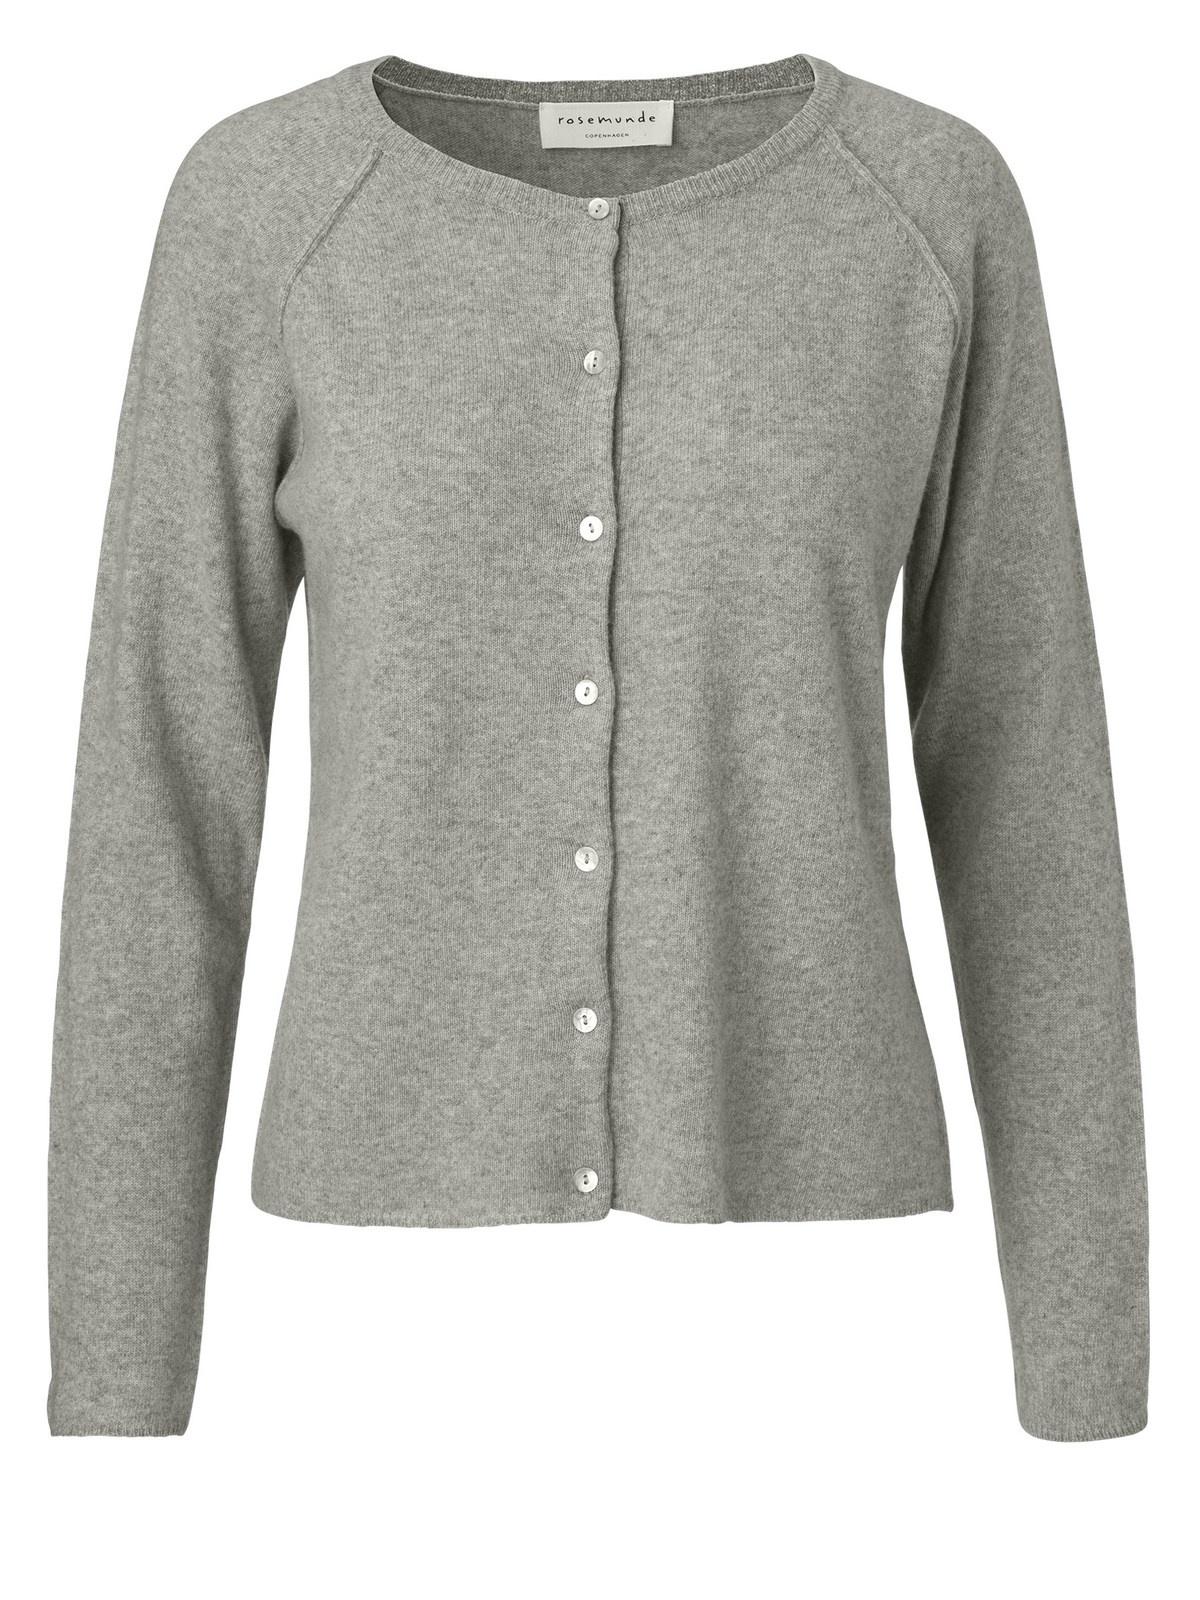 Rosemunde 1421 cardigan, light grey melange, large